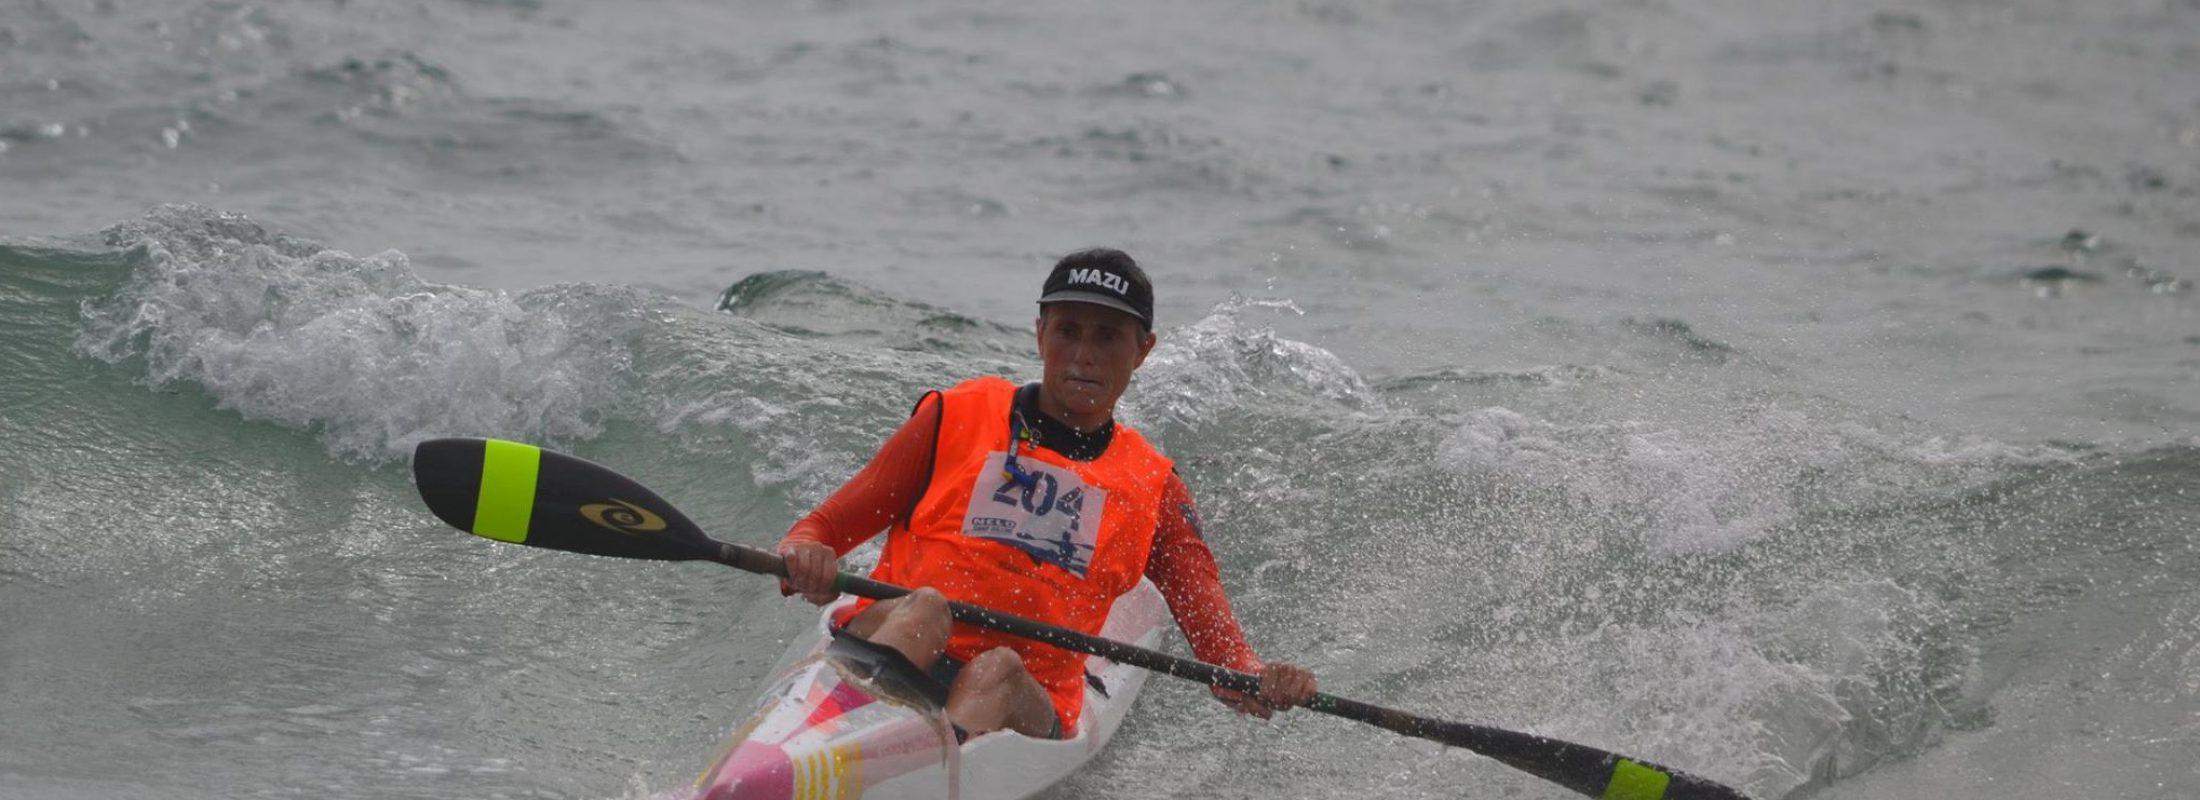 Nelo Summer Challenge - Copa del Mundo Kayak de Mar